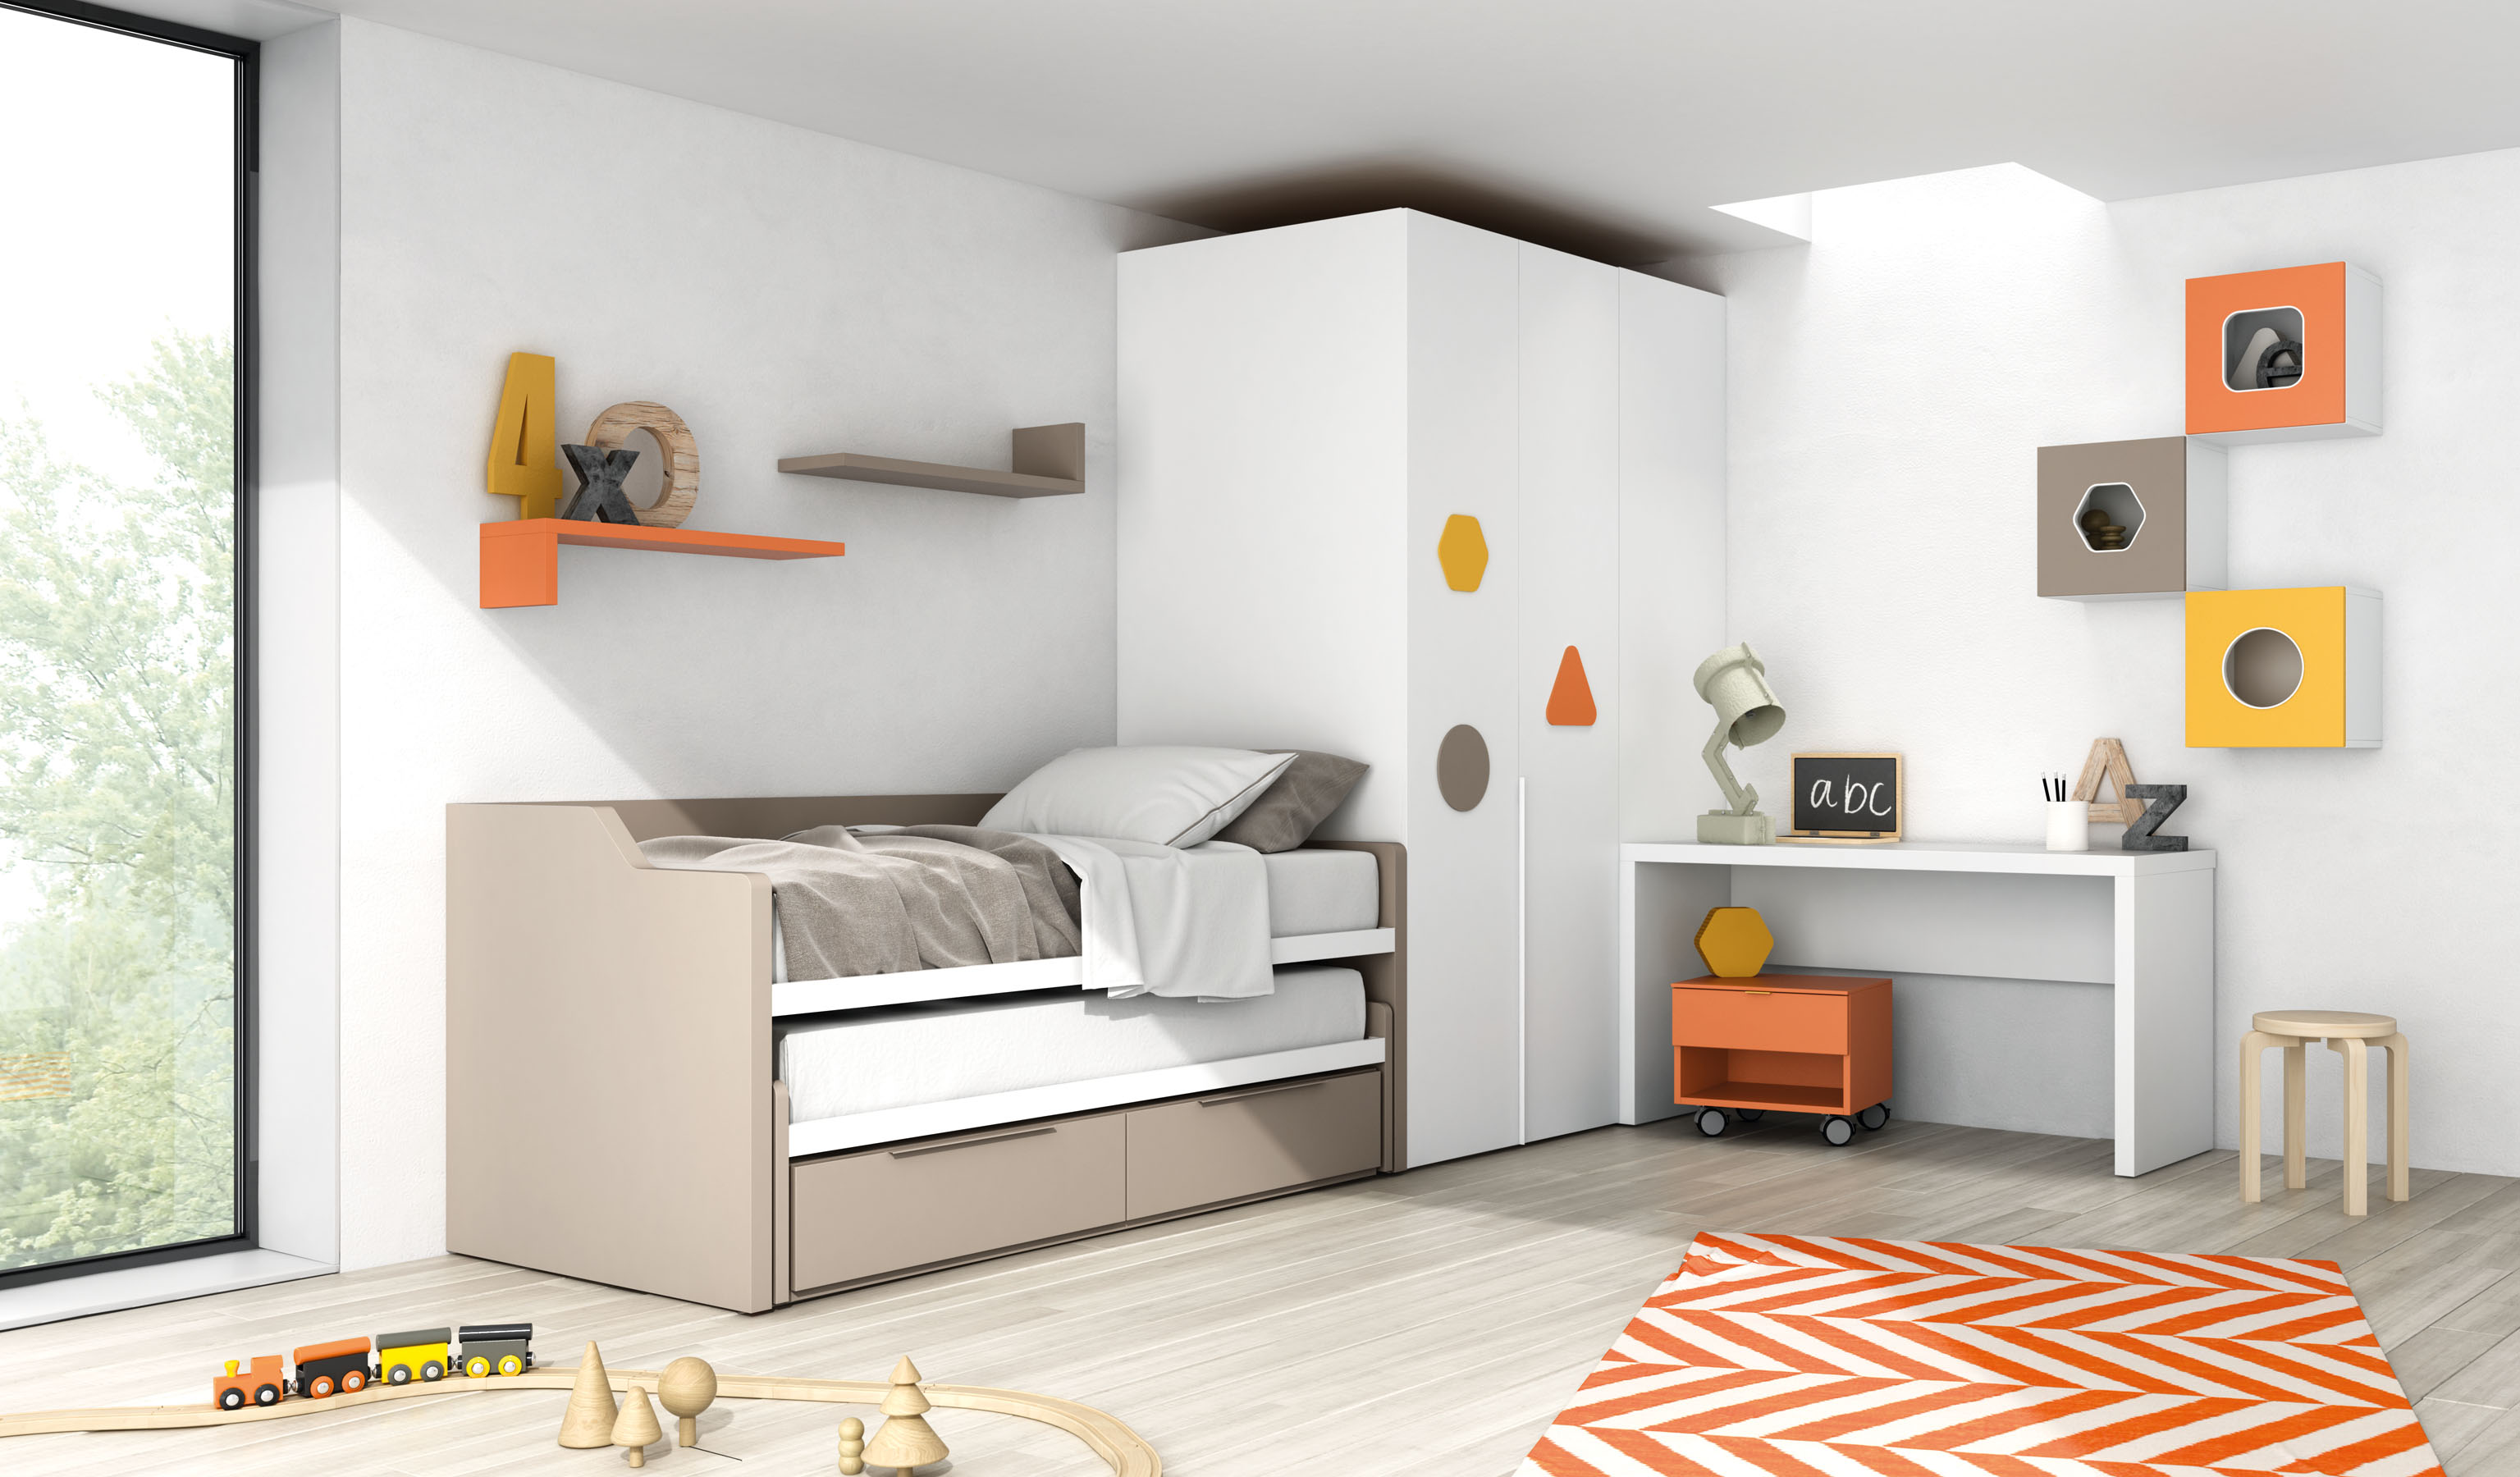 Compactos camas nido qb tegar for Camas compactas precios